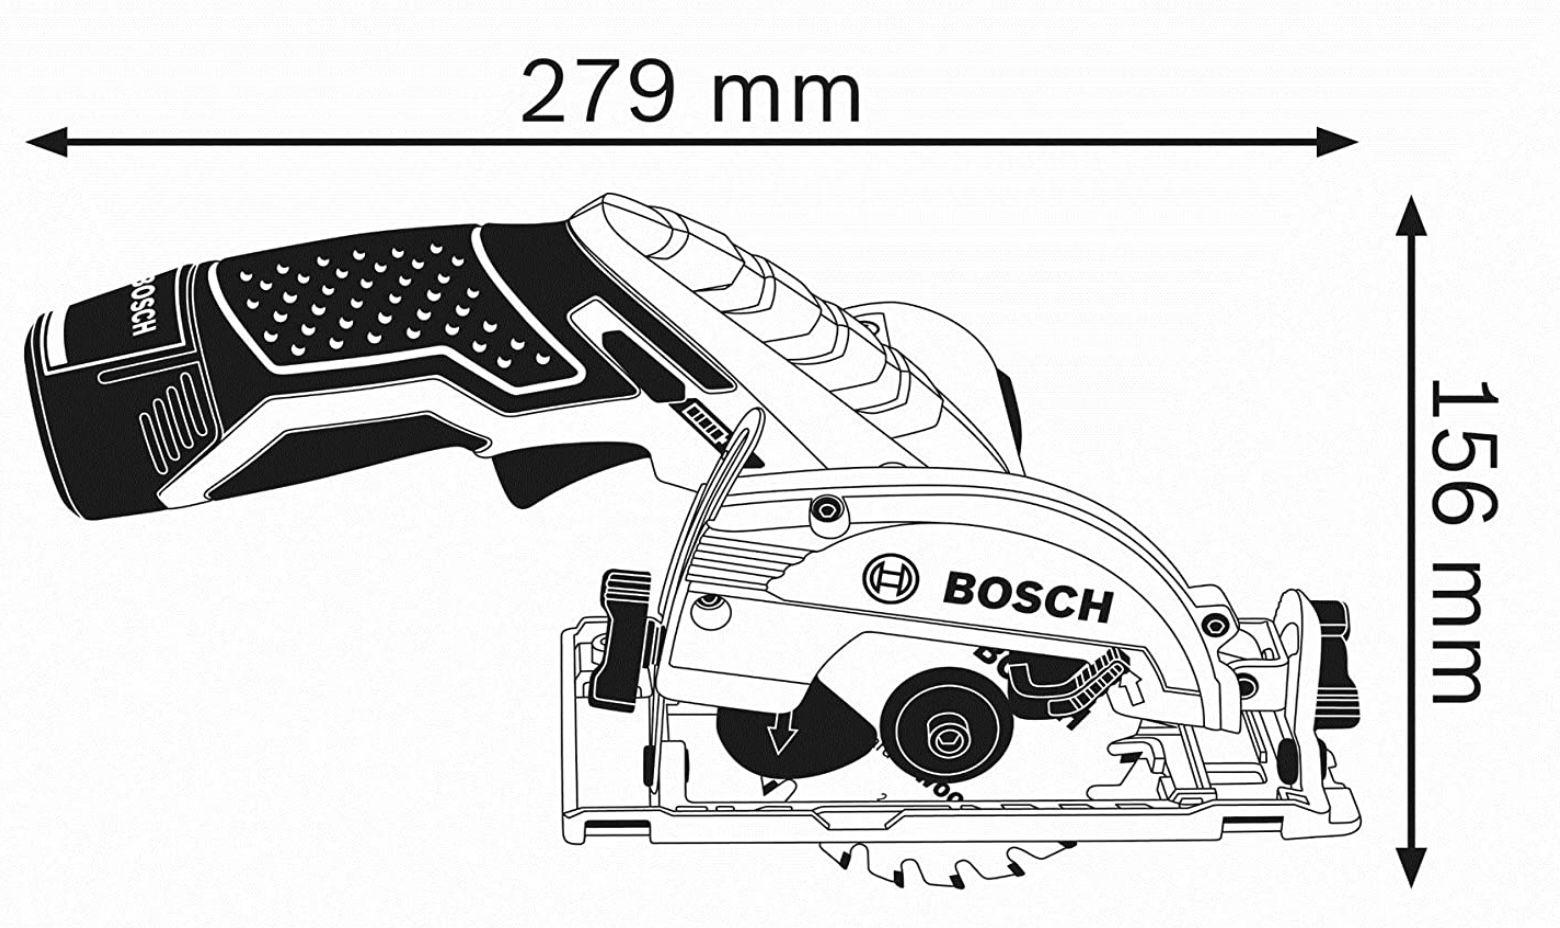 Bosch GKS 12V 26 Akku Kreissäge inkl. 2x 3,0 Ah Akku + Ladegerät für 125,99€ (statt 169€)